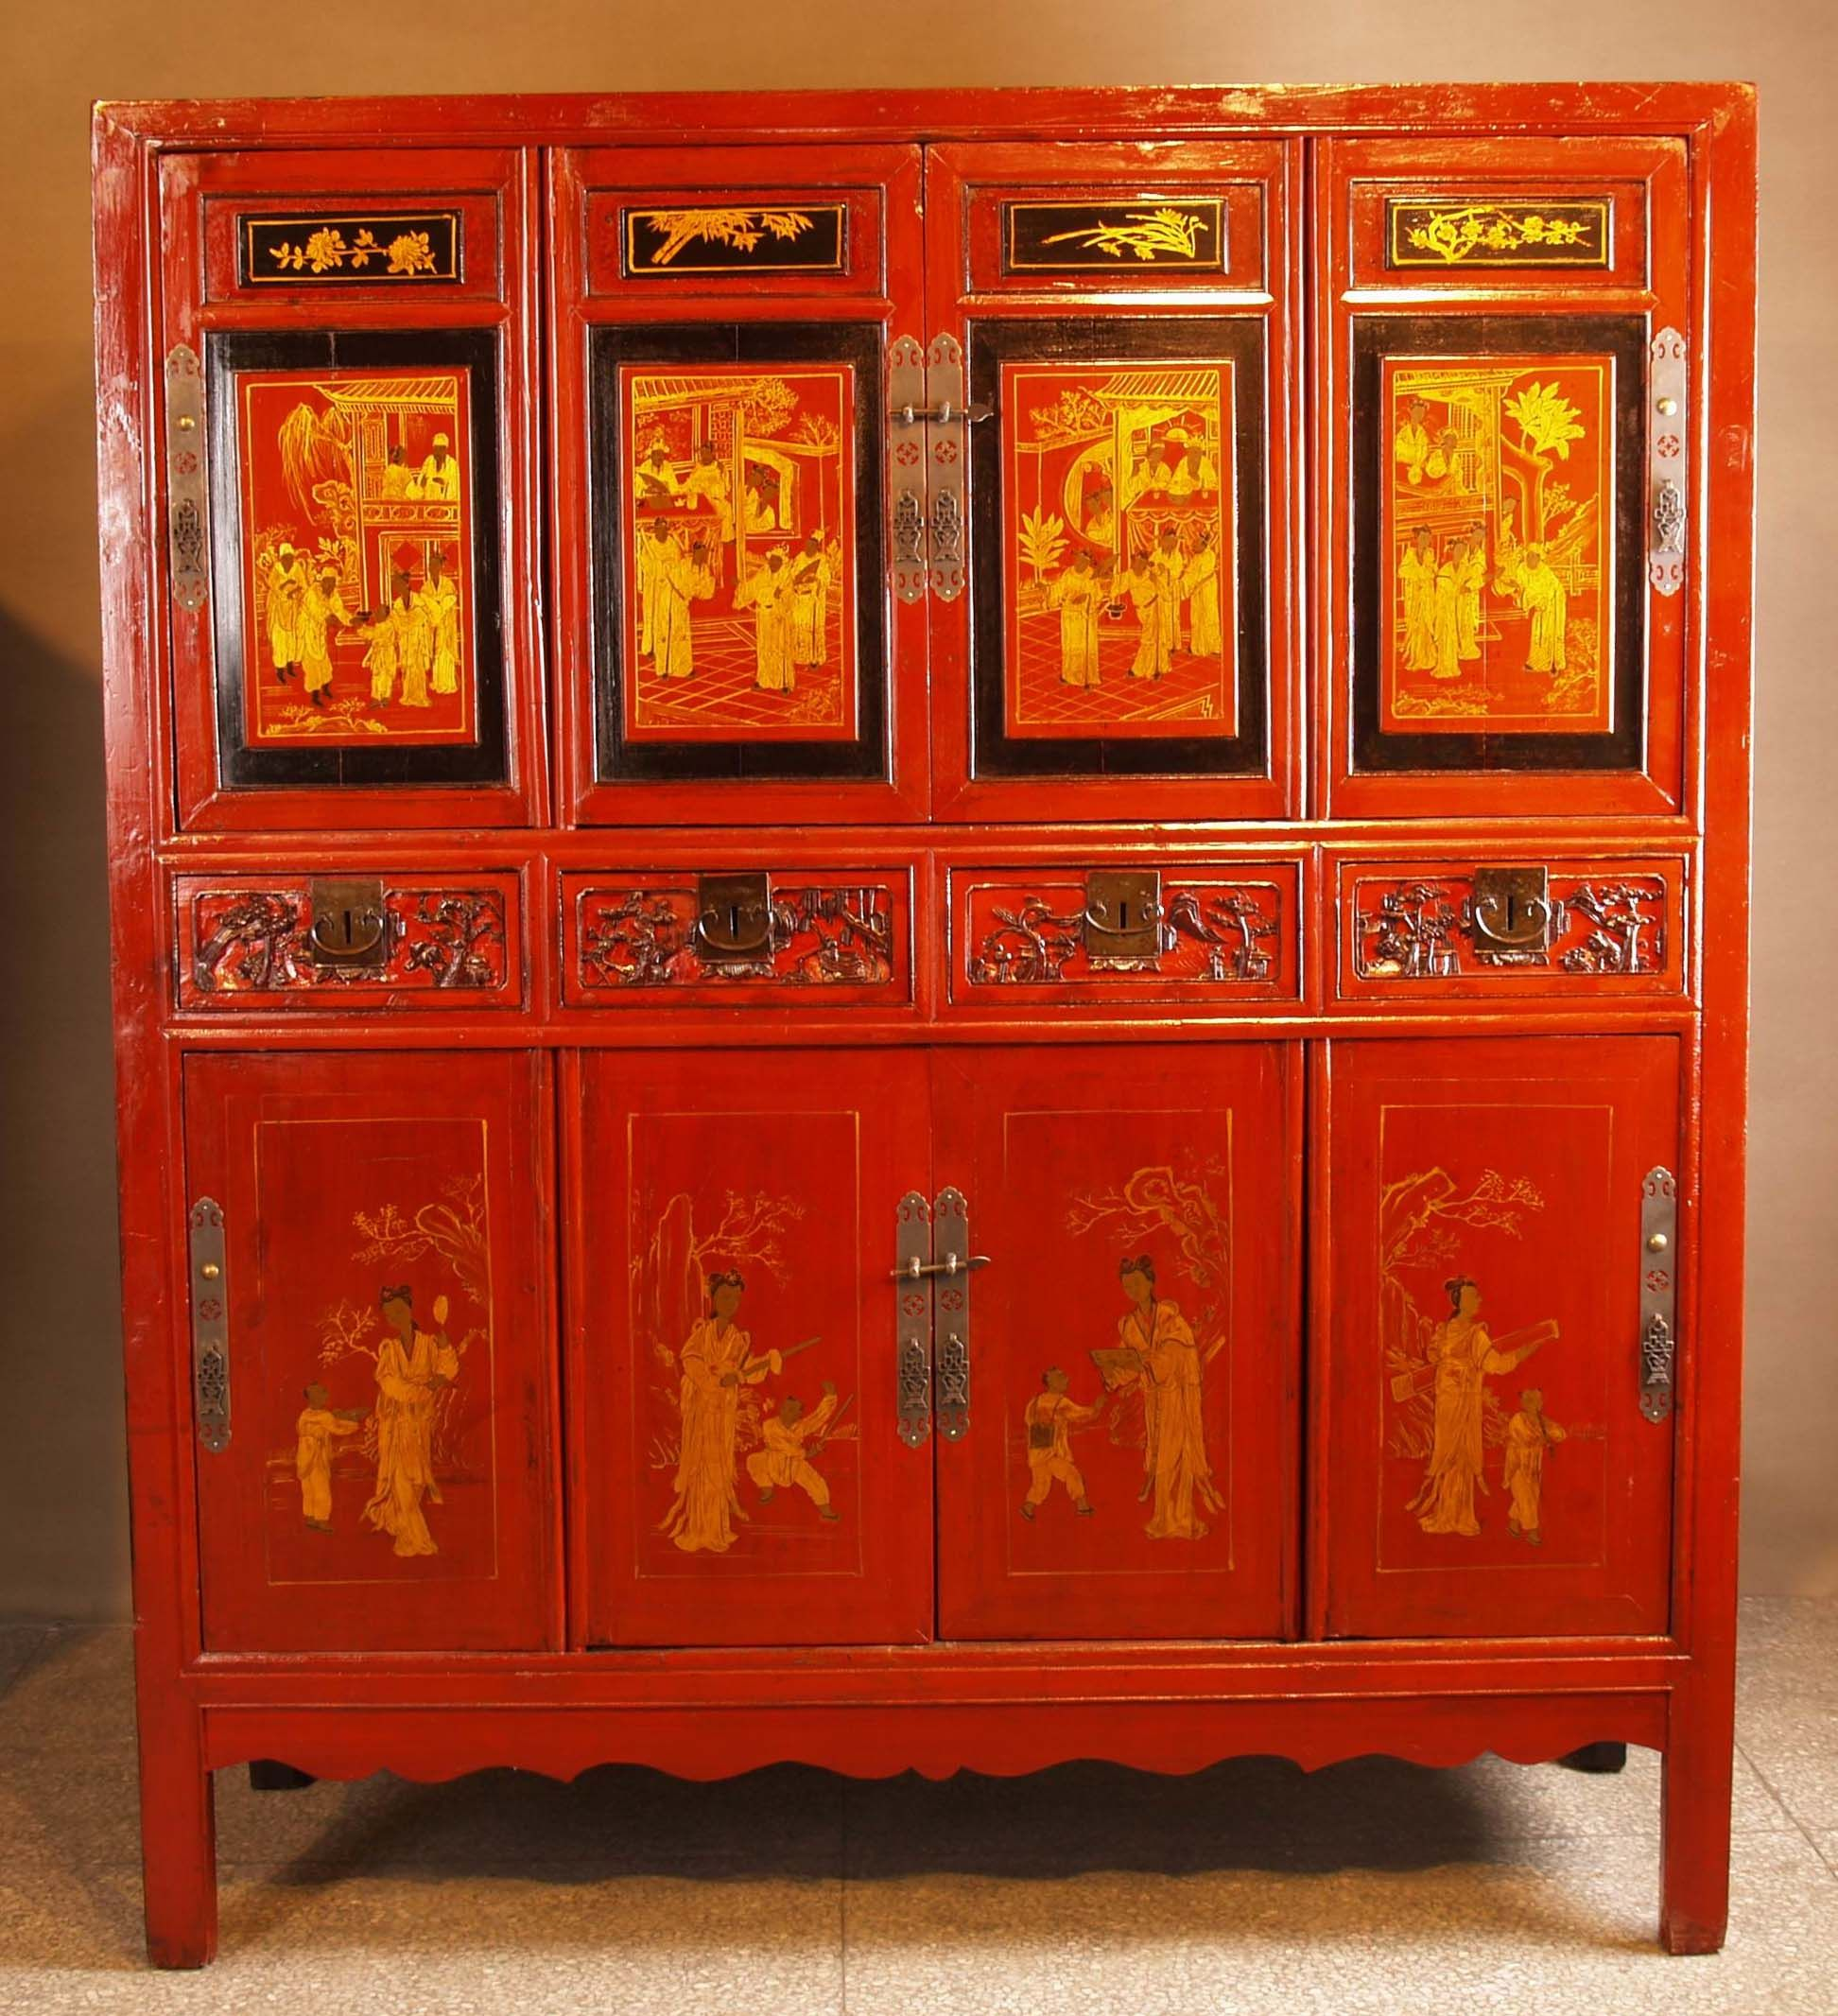 Cheap Vintage Couches: Asian Antique Furniture